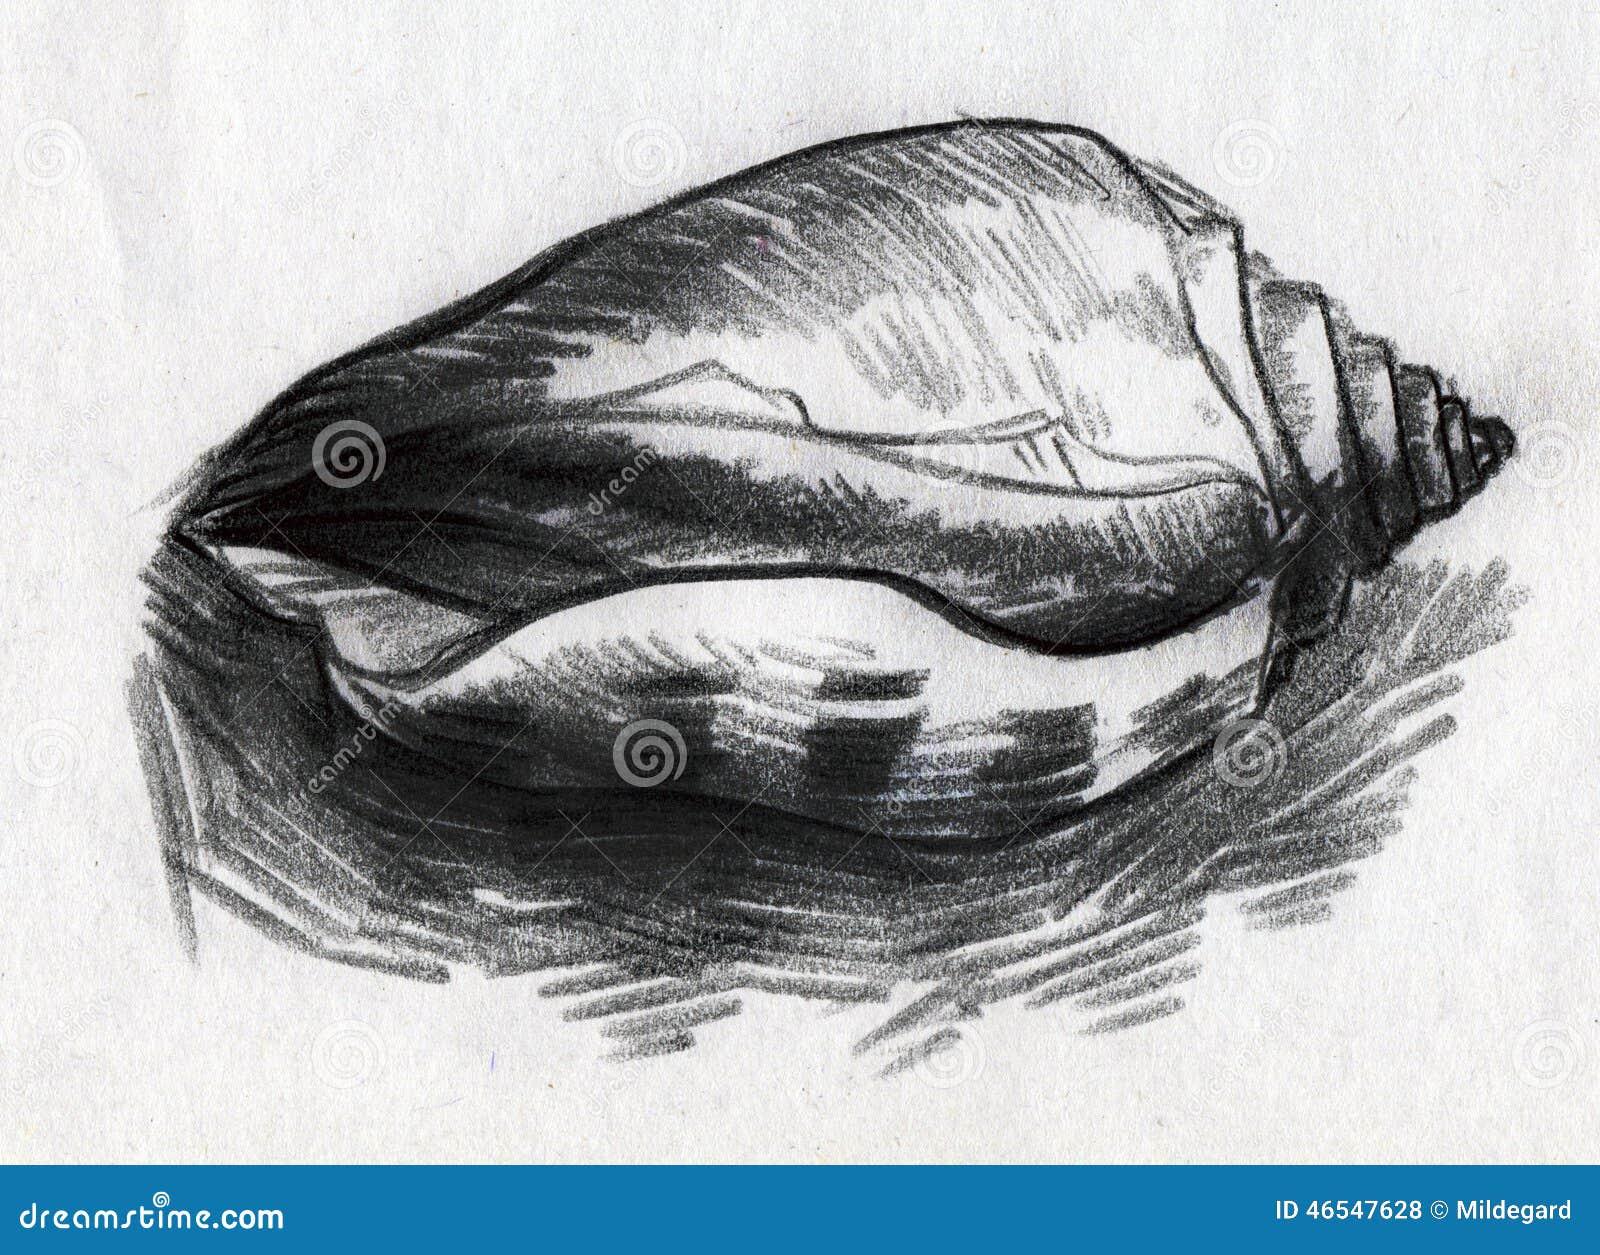 Uncategorized Shell Drawings striped sea shell sketch stock illustration image 46547628 royalty free illustration